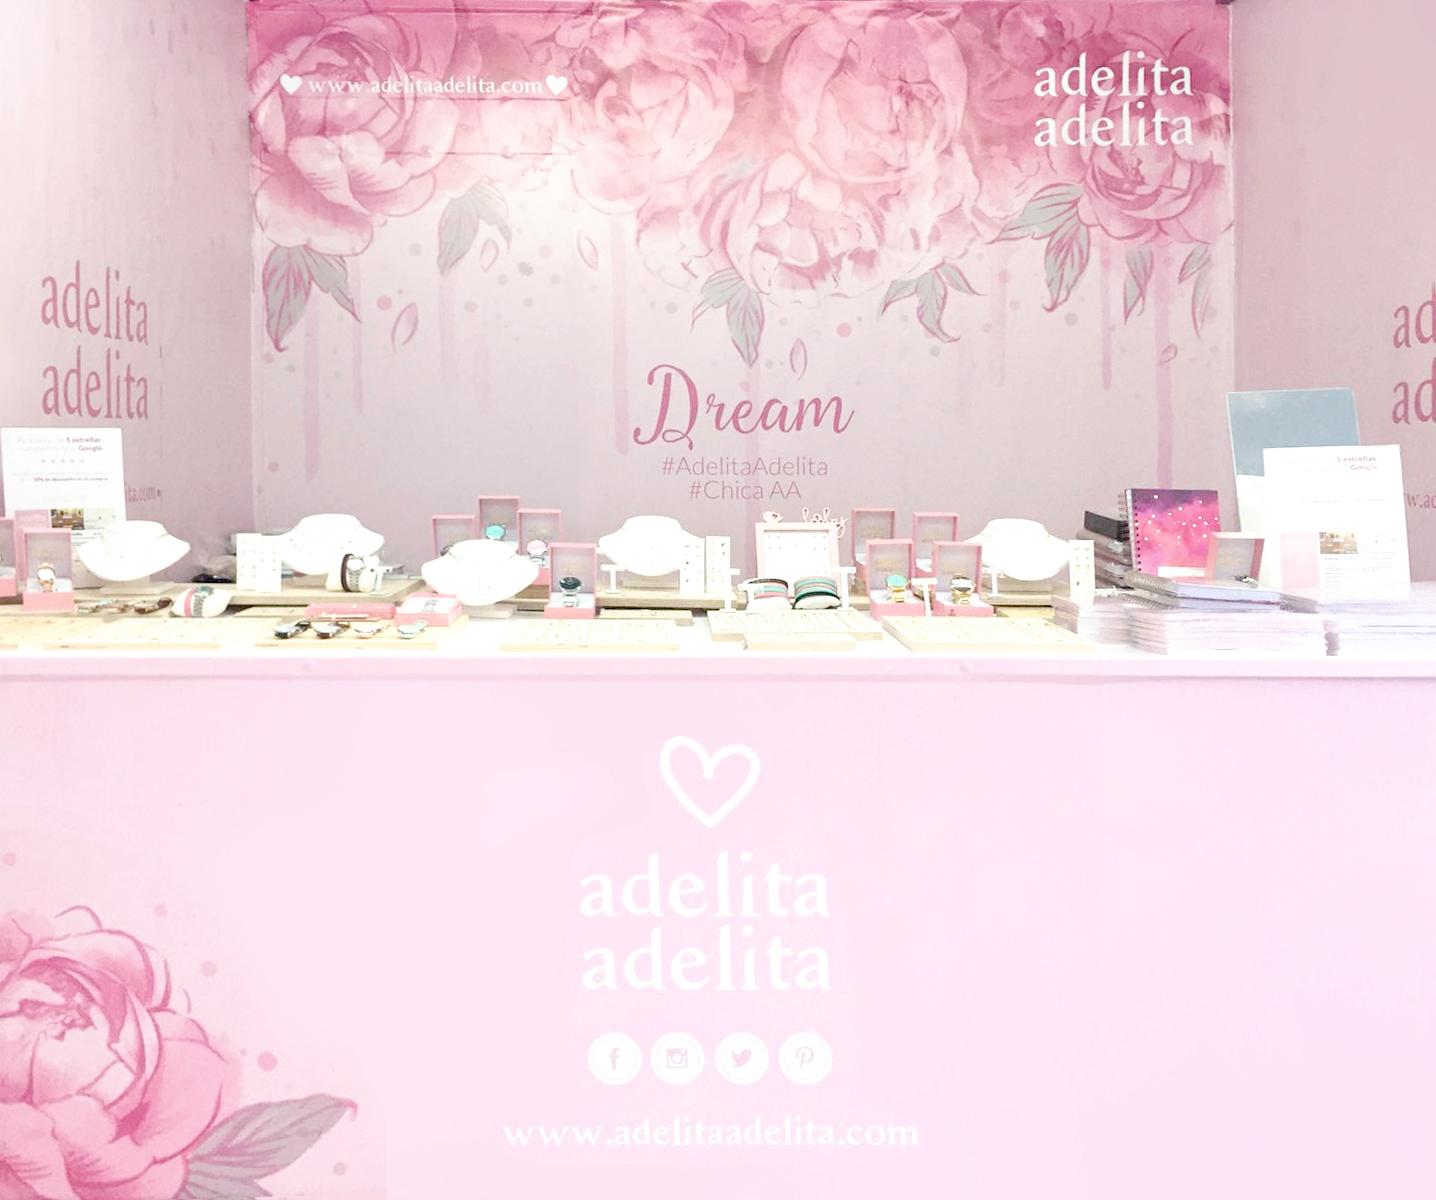 Adelita Adelita temporary stand 2016